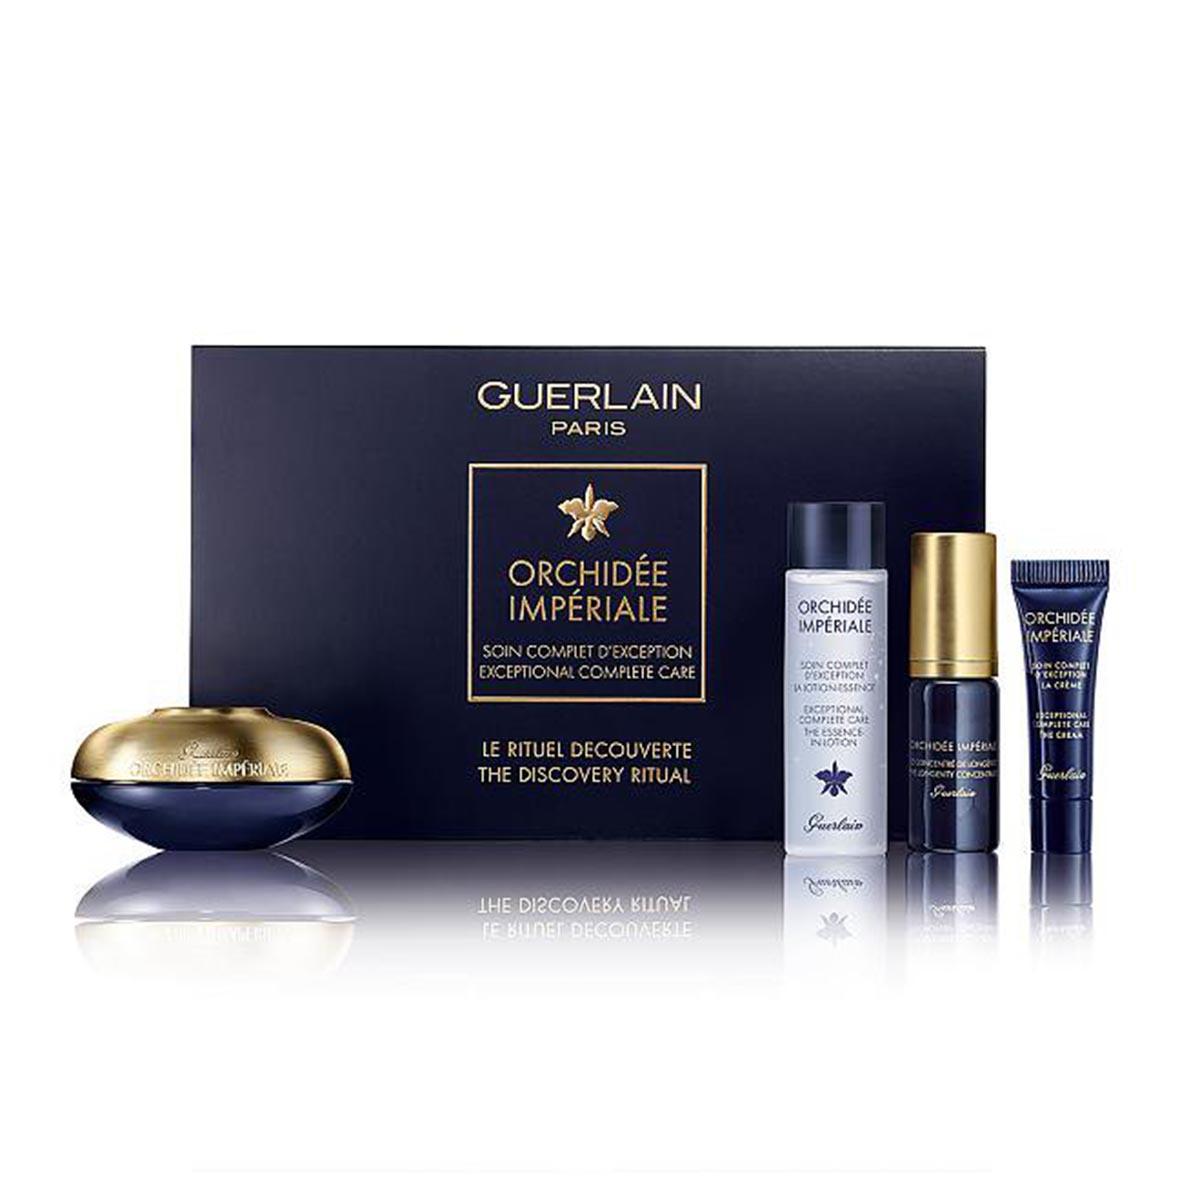 Guerlain orchidee imperiale 4g eye cream 15ml essence lotion 15ml concentrate 5ml eye cream 3ml